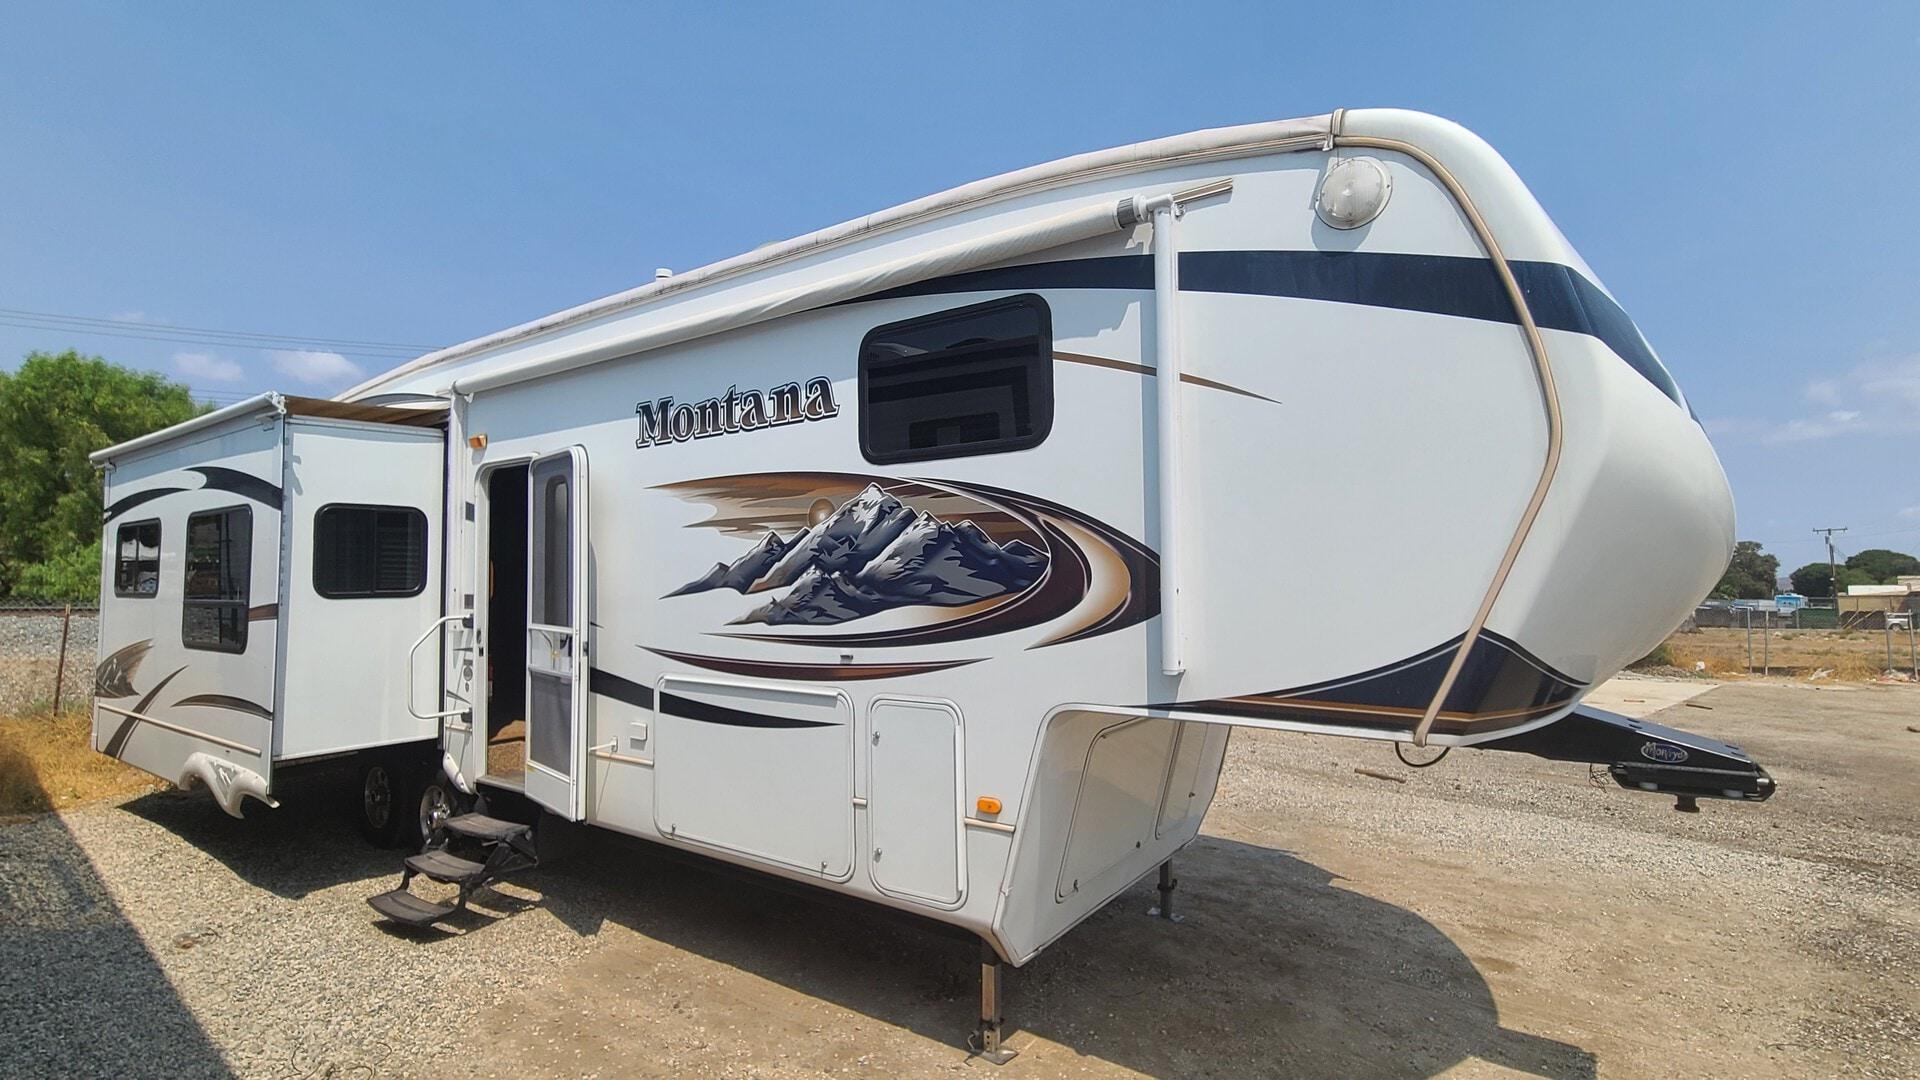 Used, 2010, Montana, 3665RE, Fifth Wheels